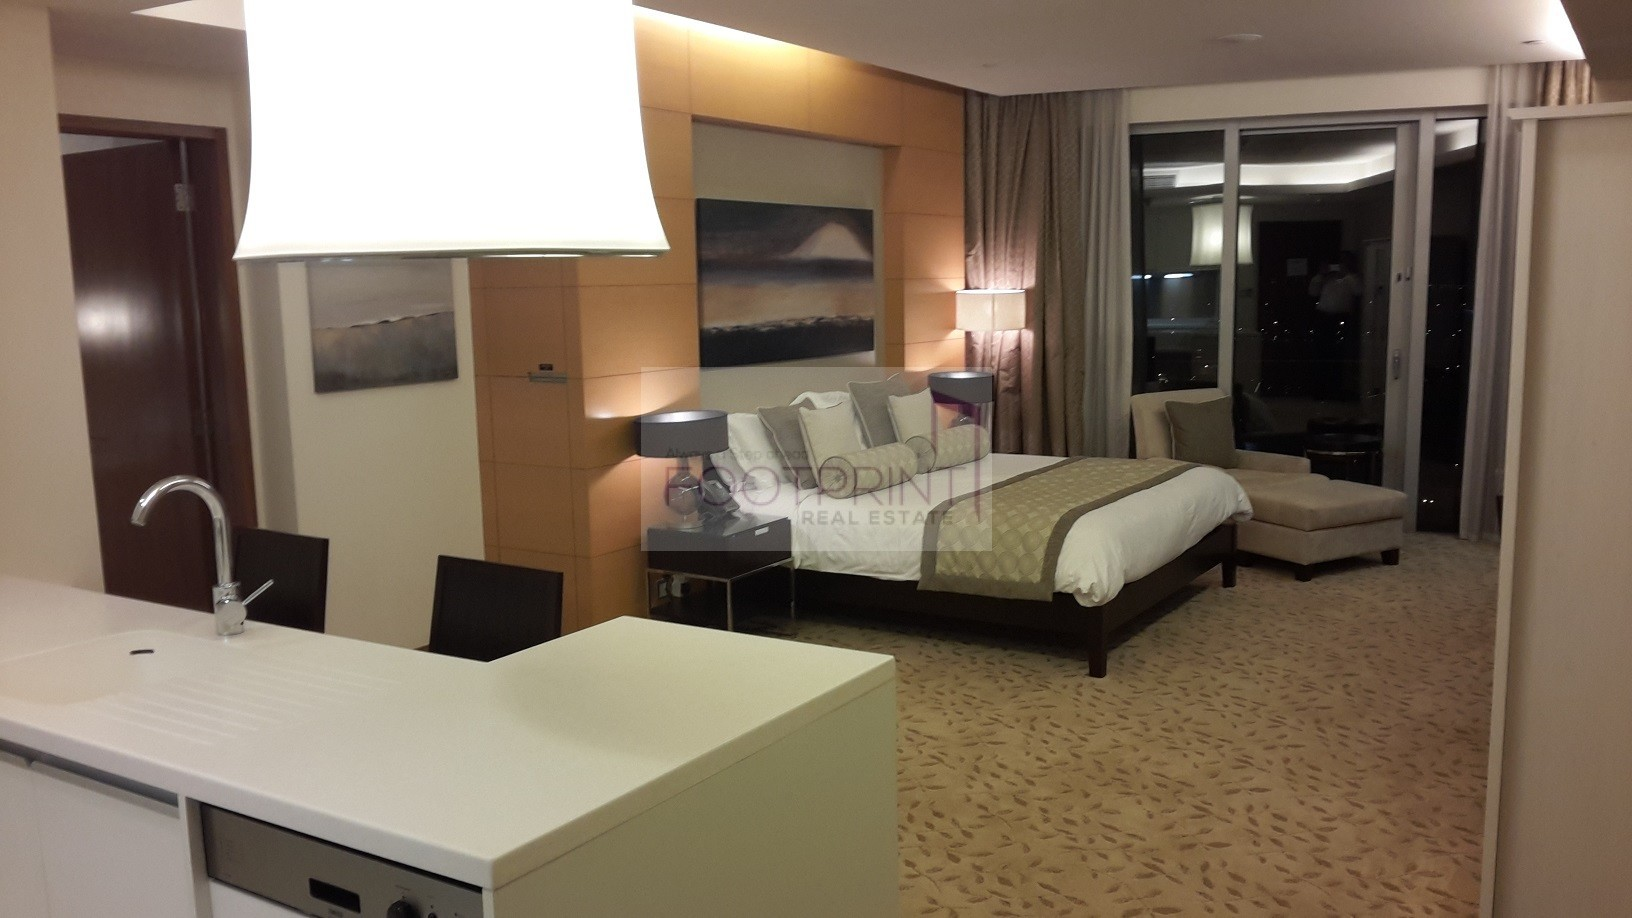 5* Hotel 650 Sq Ft Studio Inclsve Bills